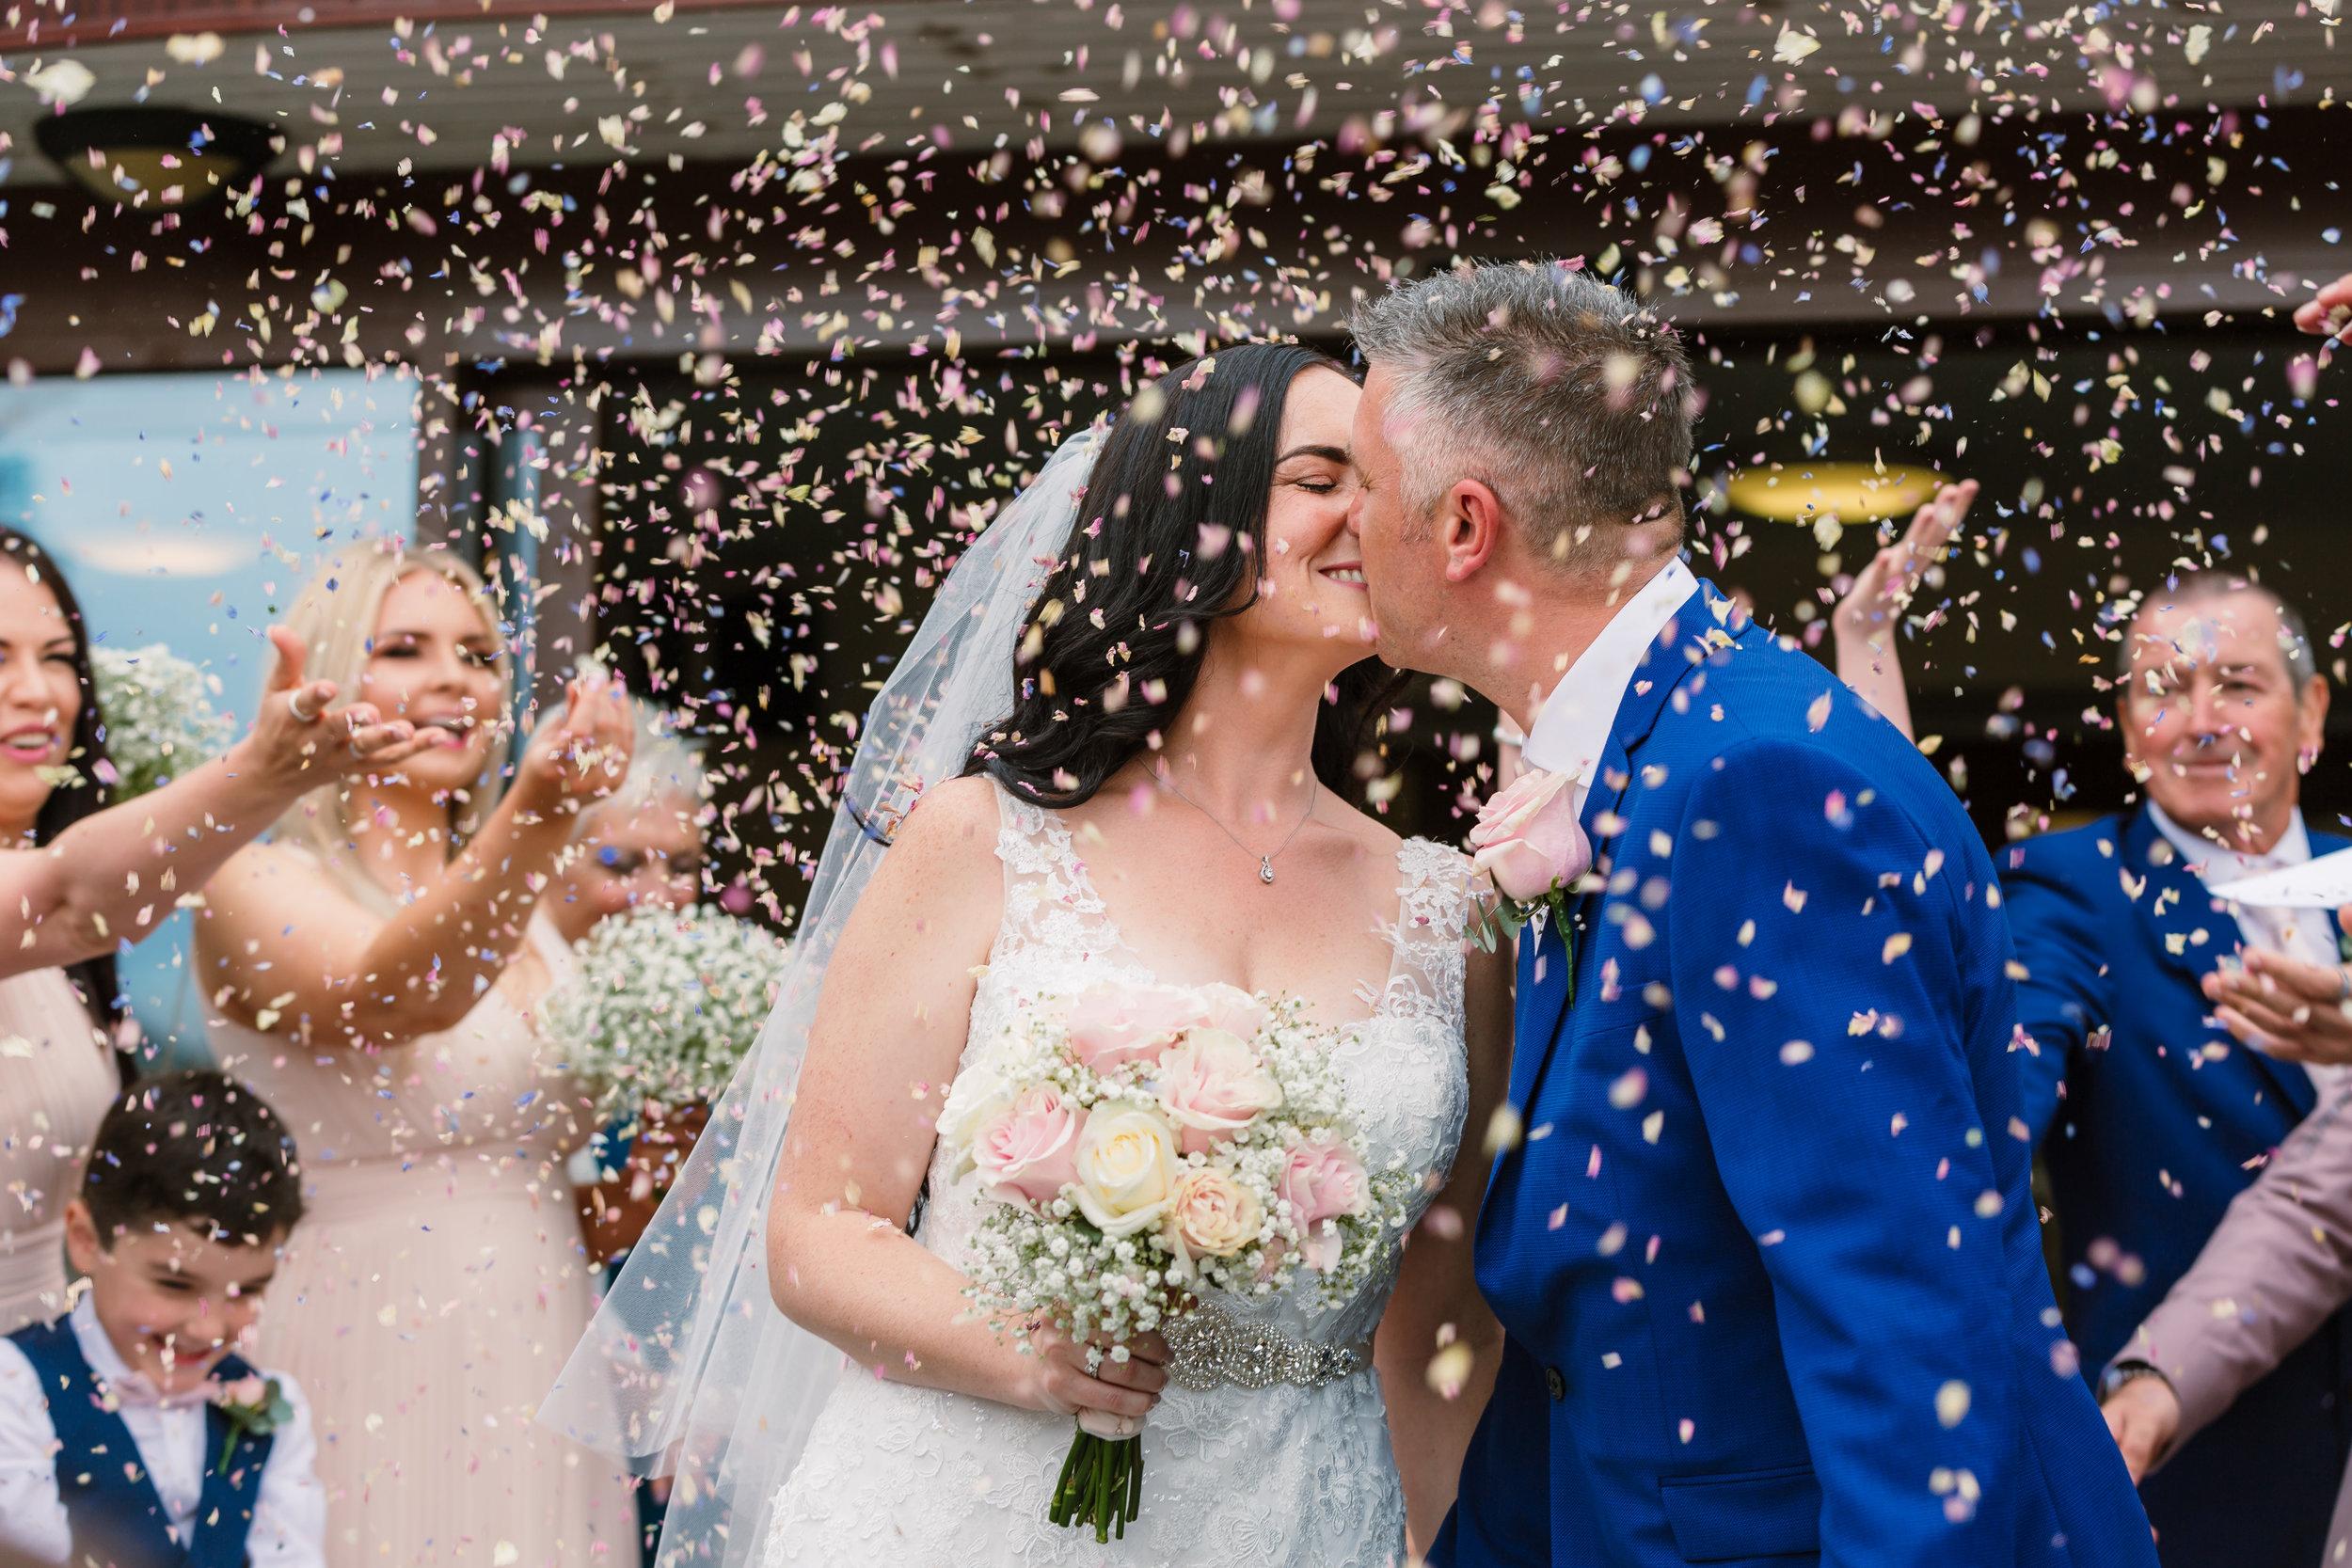 Sarah-Fishlock-Photography : Hampshire-wedding-photographer-hampshire : fleet-wedding-photographer-fleet : Meade-Hall-Wedding-Photographer : Meade-Hall-Wedding-Photos